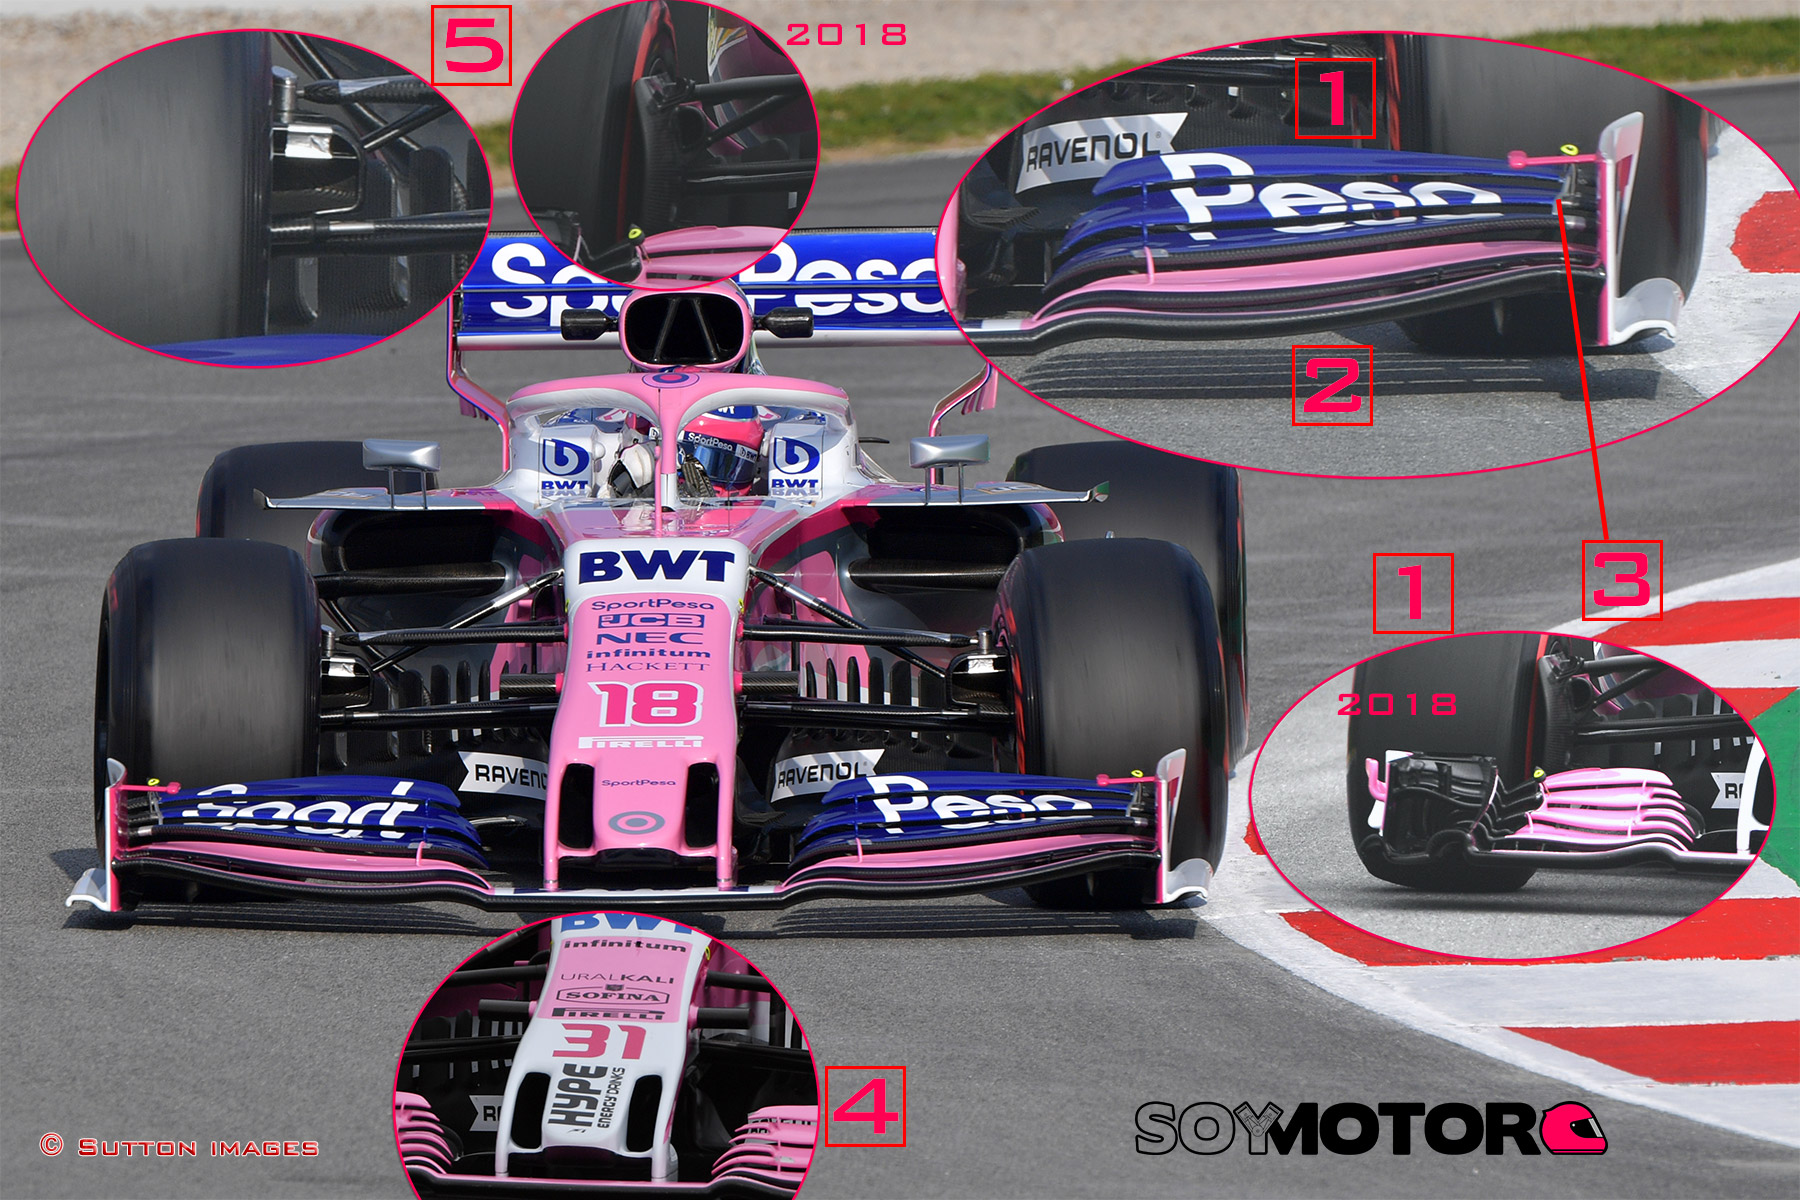 rp19-frontal-soymotor.jpg